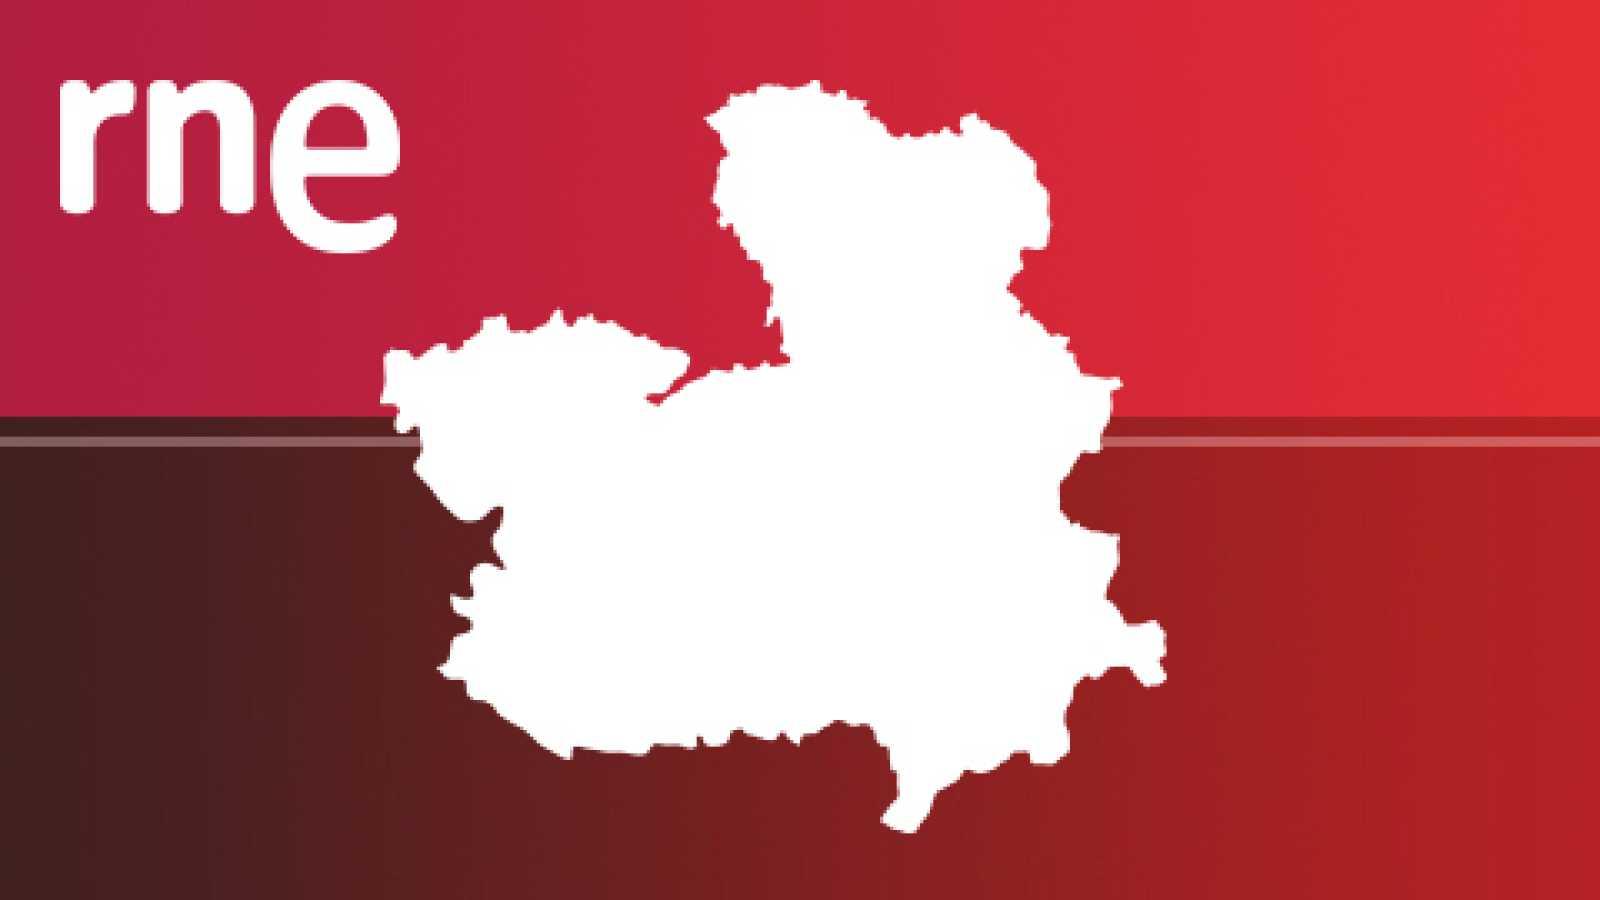 Crónica de Castilla-La Mancha 09/04/2021 - Escuchar ahora